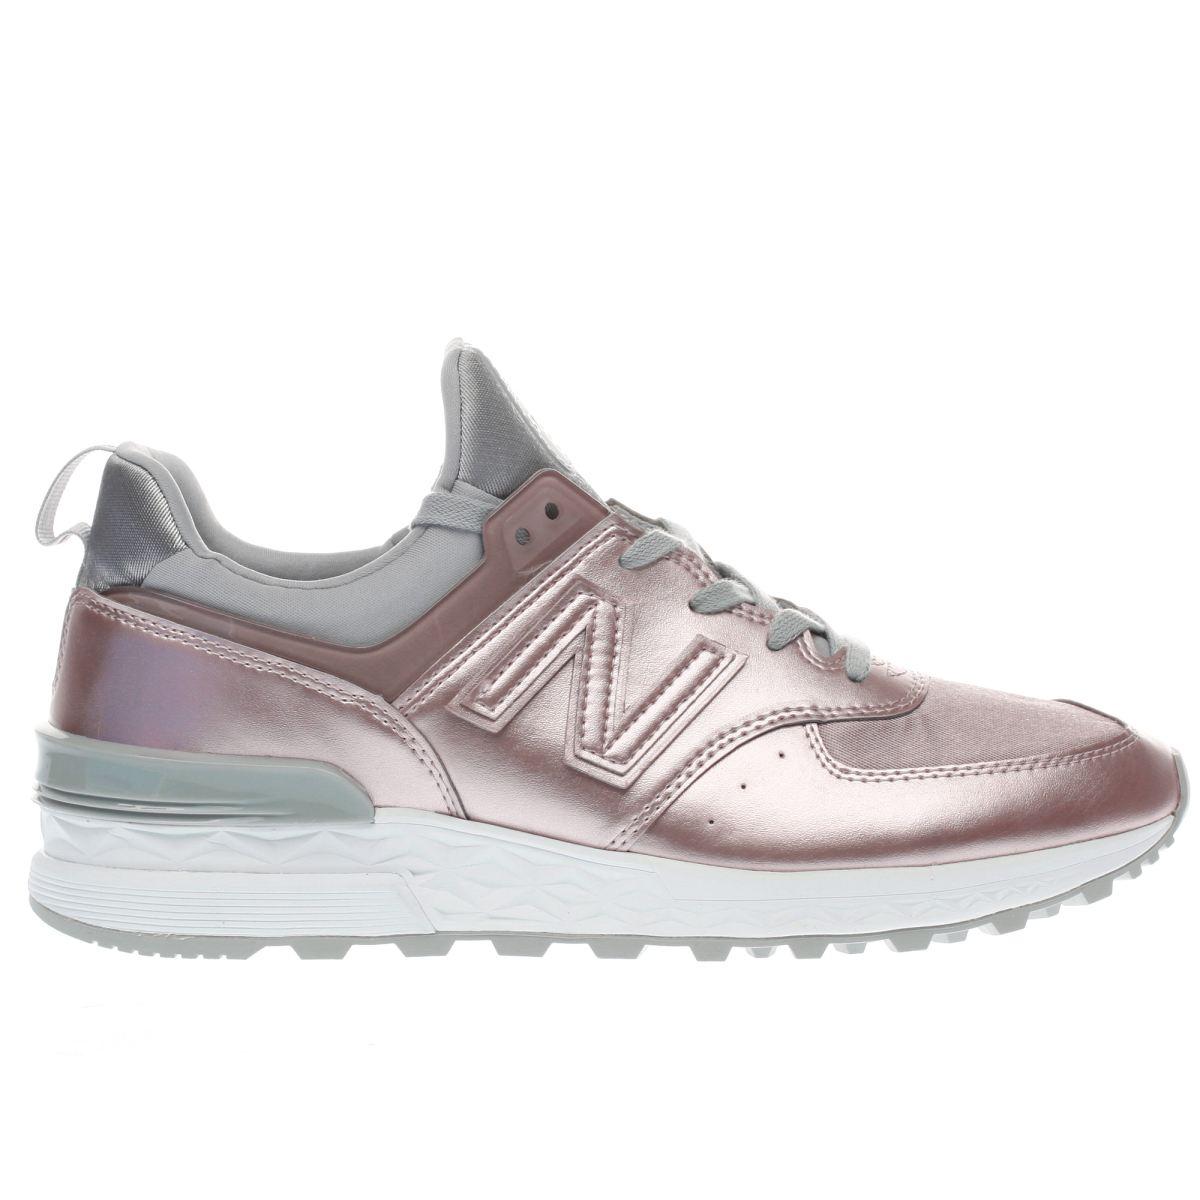 new balance rose gold 574 sport metallic trainers